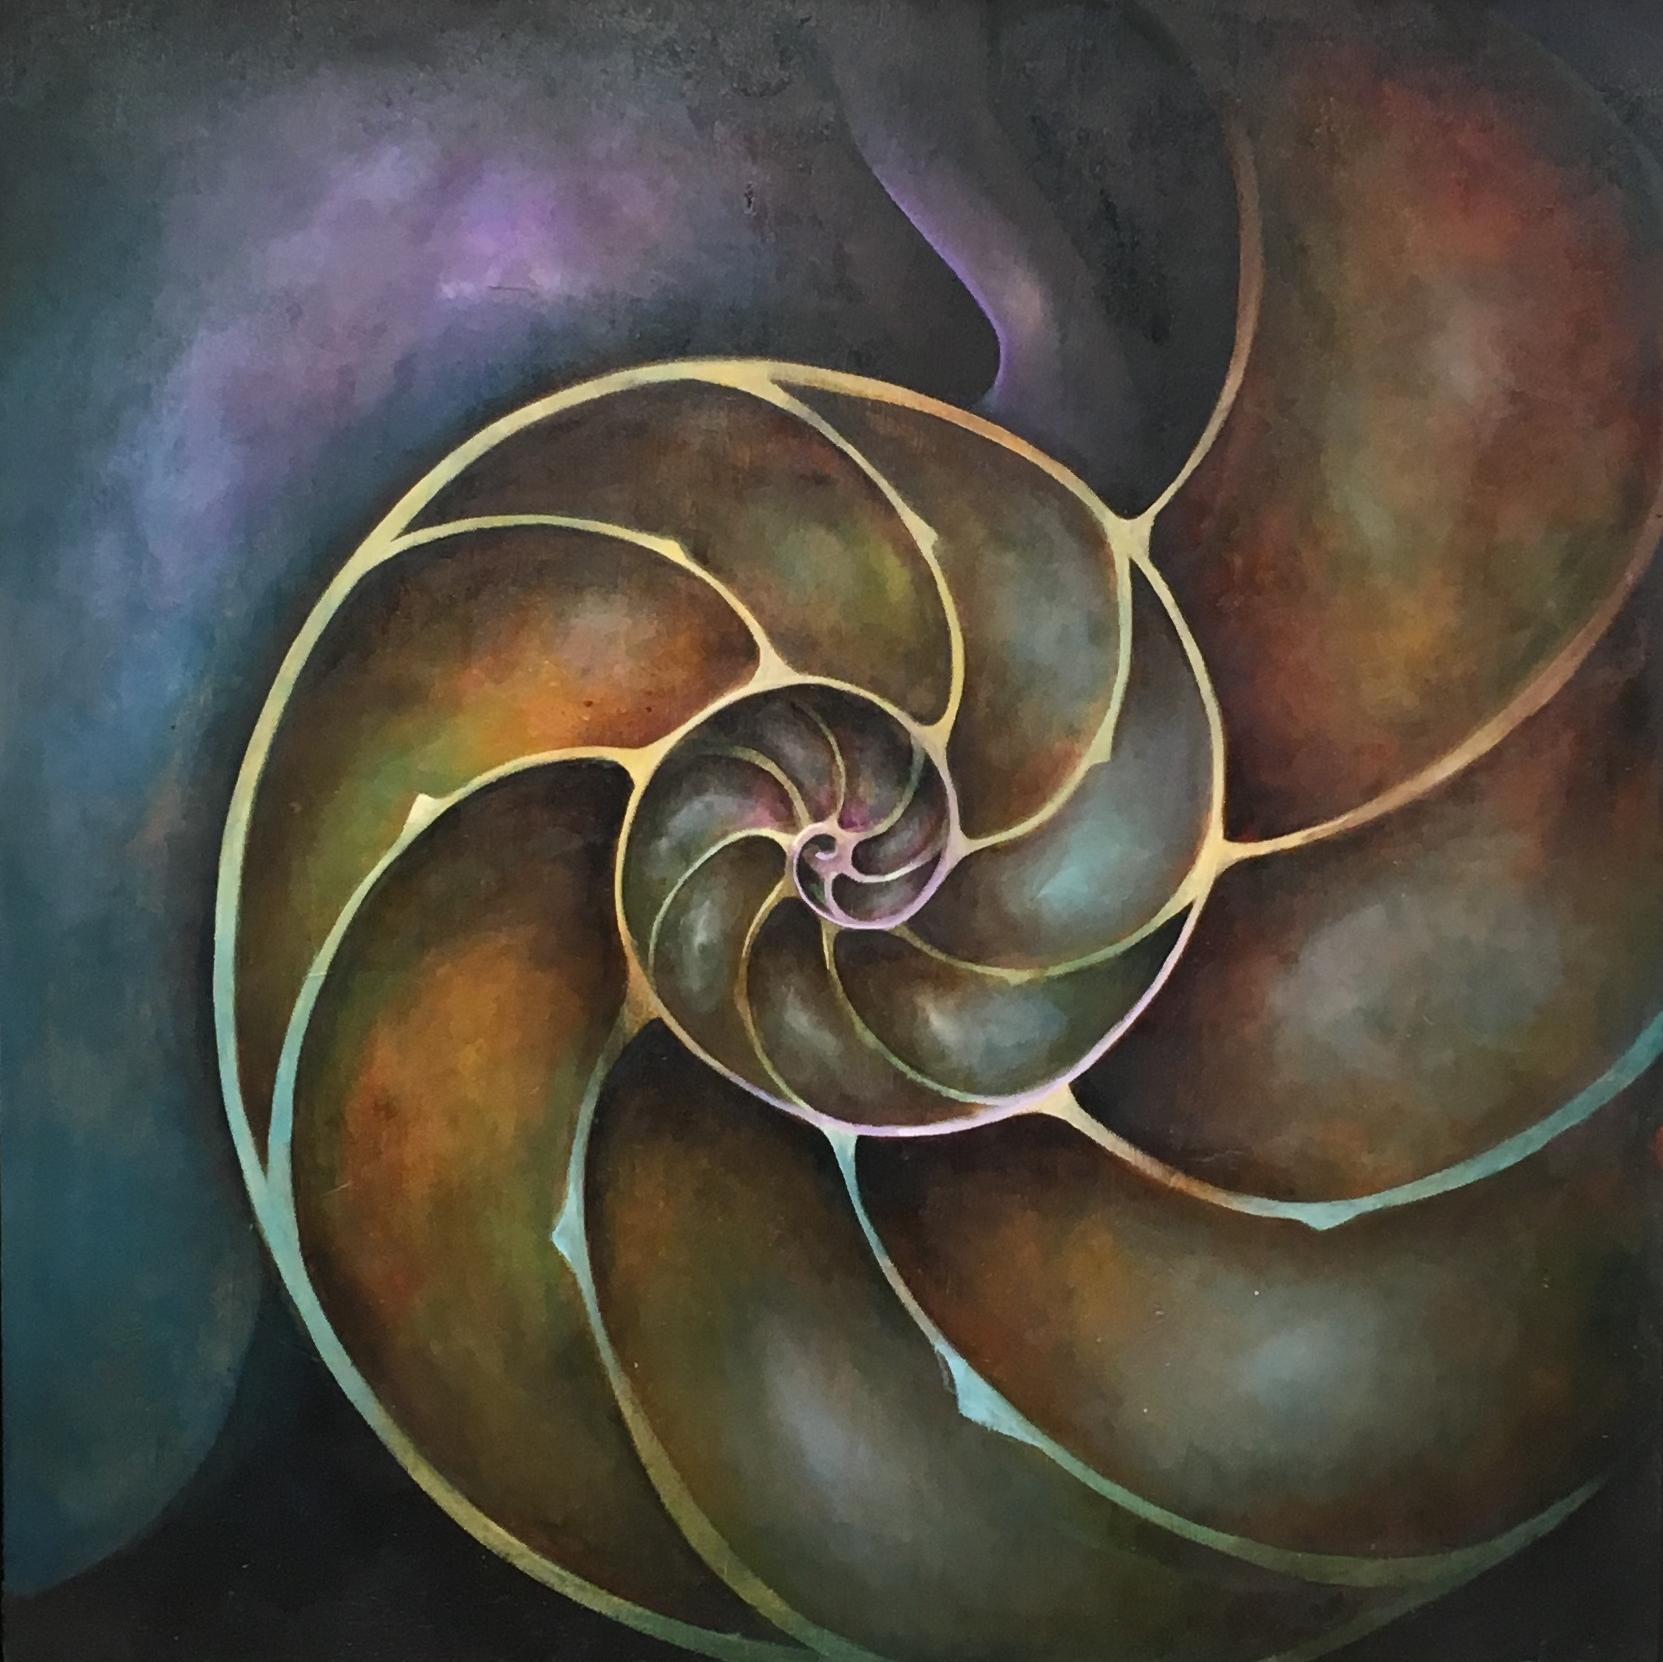 Nautilus Spiral (Nautilidae)